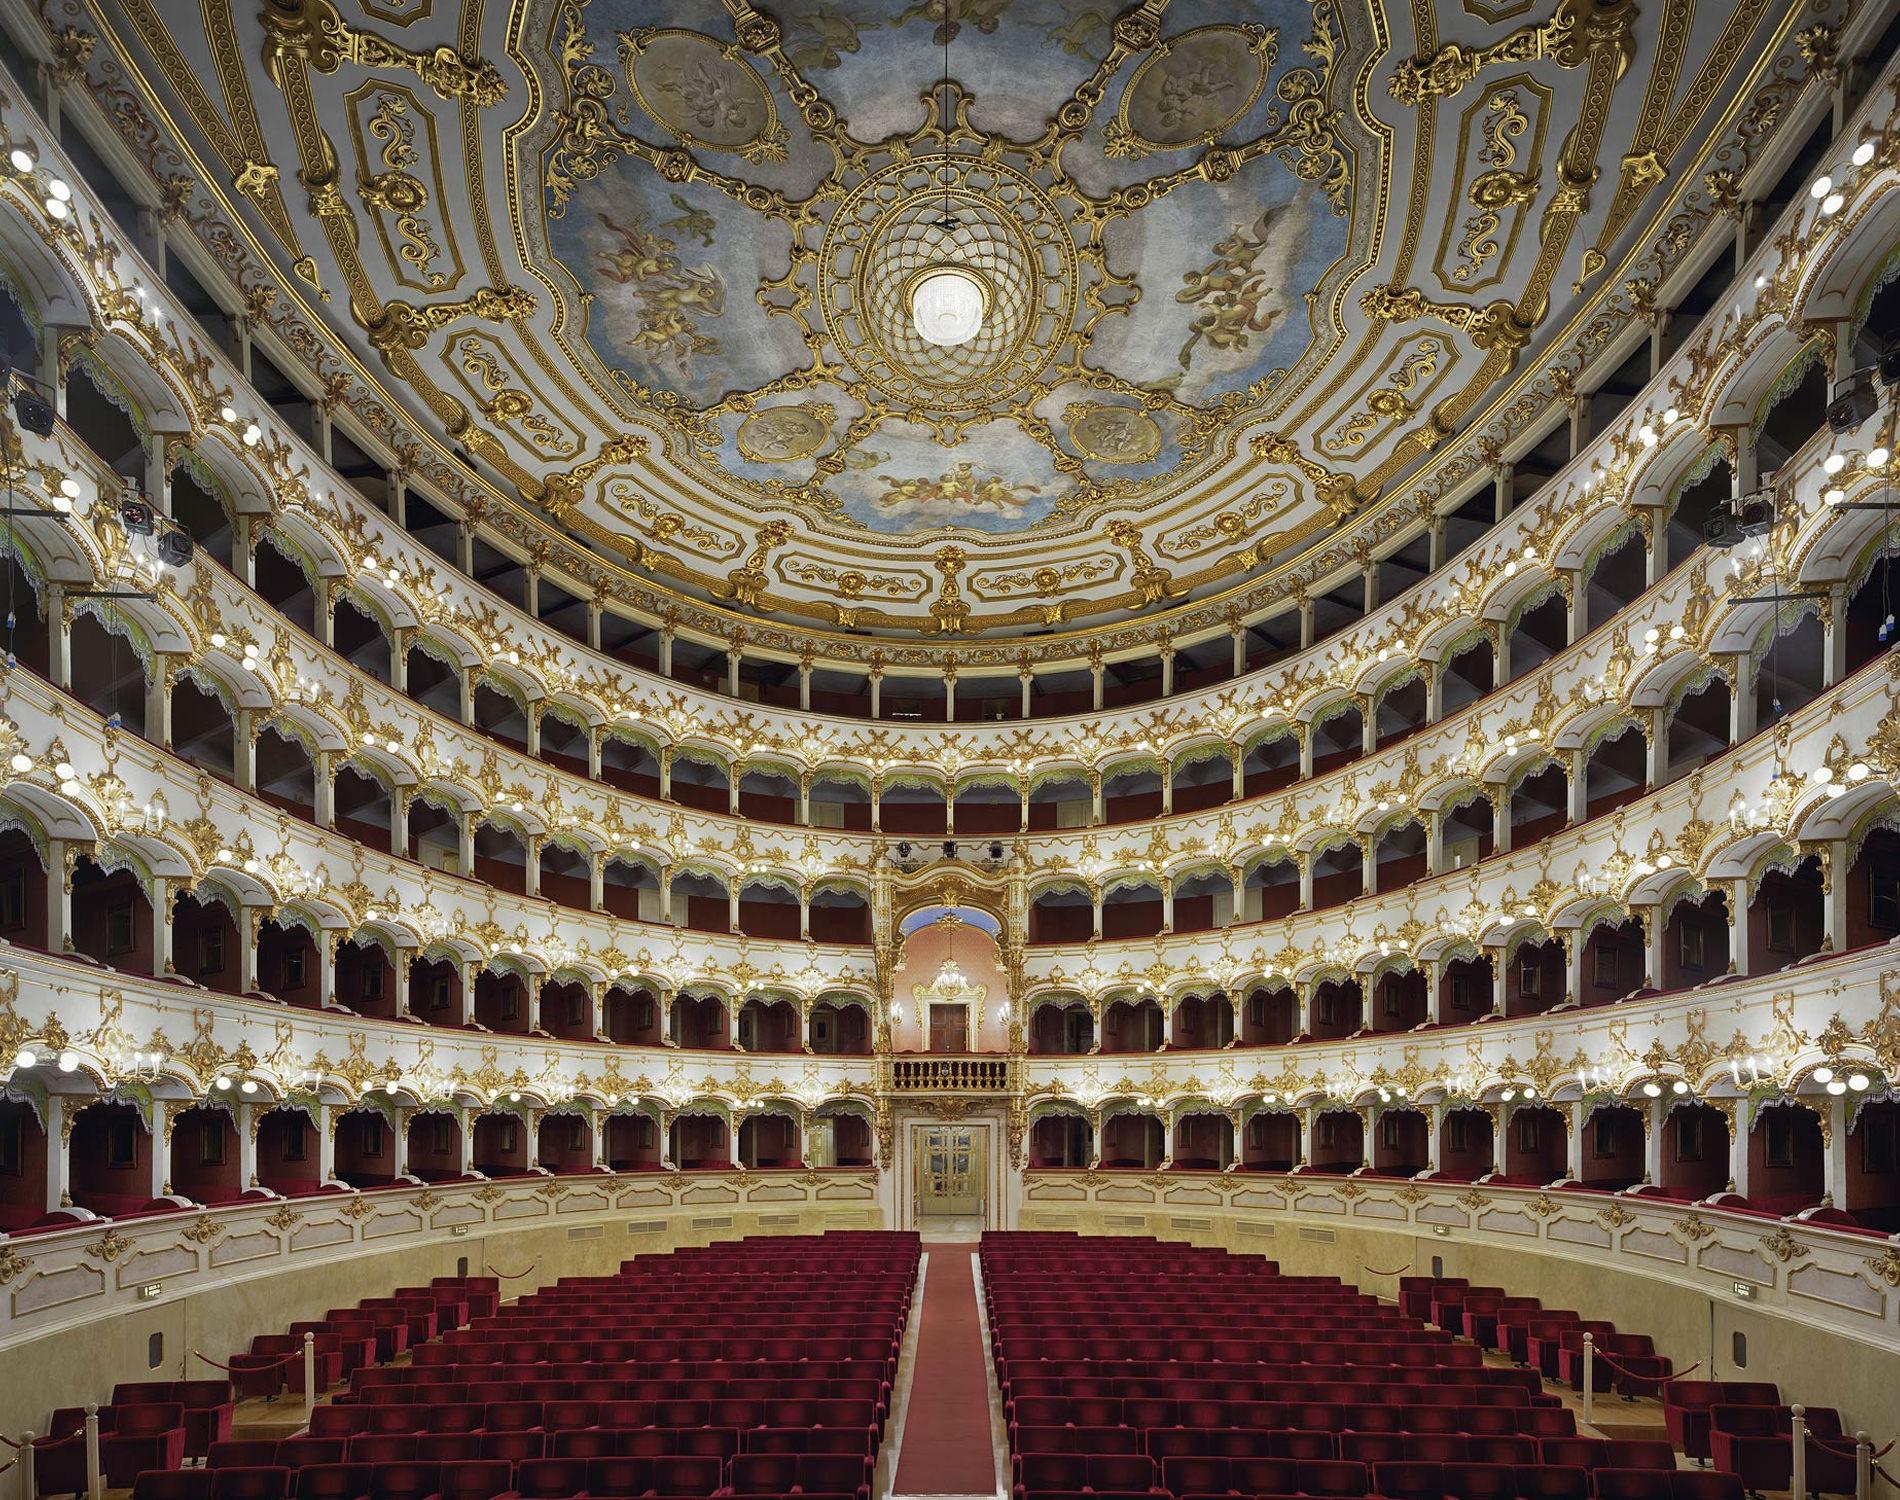 David Leventi Serie Photographie Opera Teatro Municipale Plaisance Italie